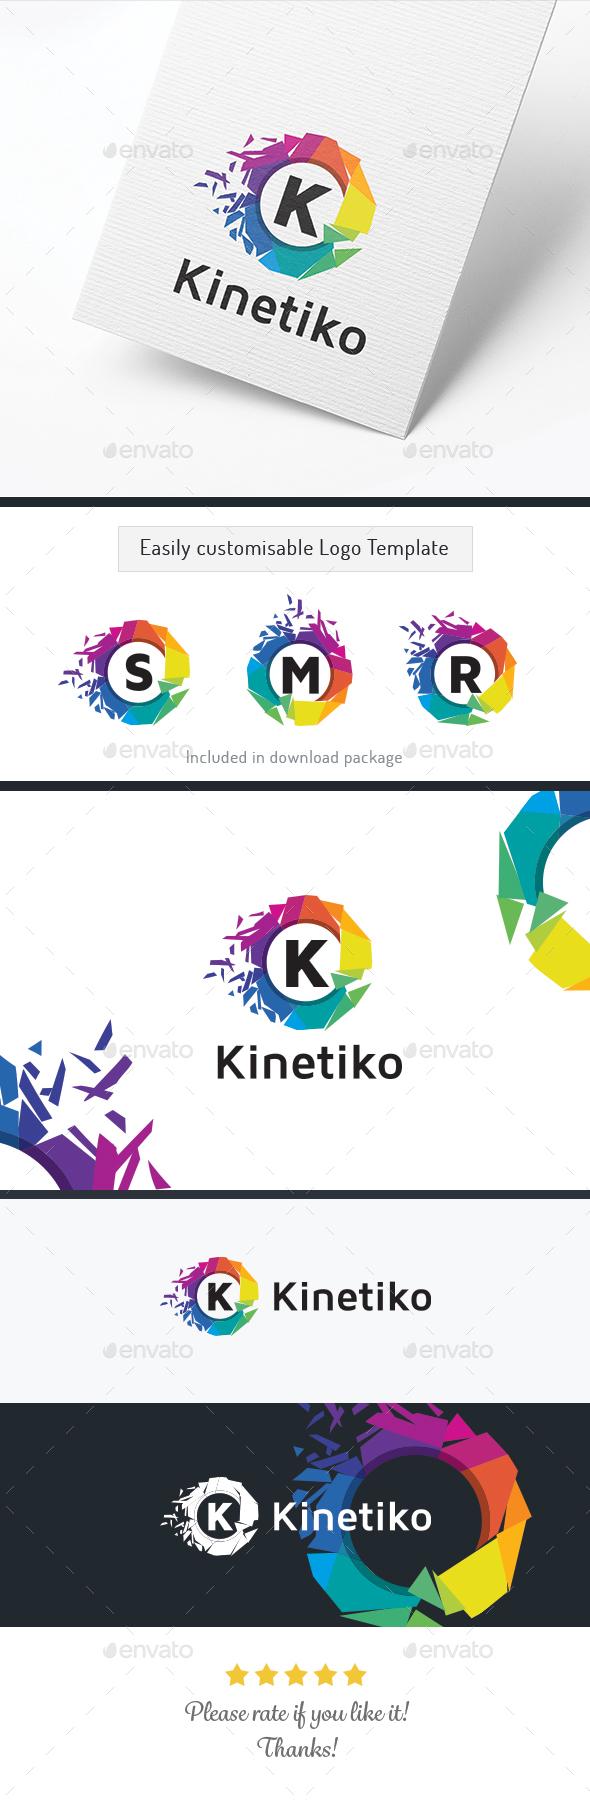 Kinetiko Letter / Alphabet